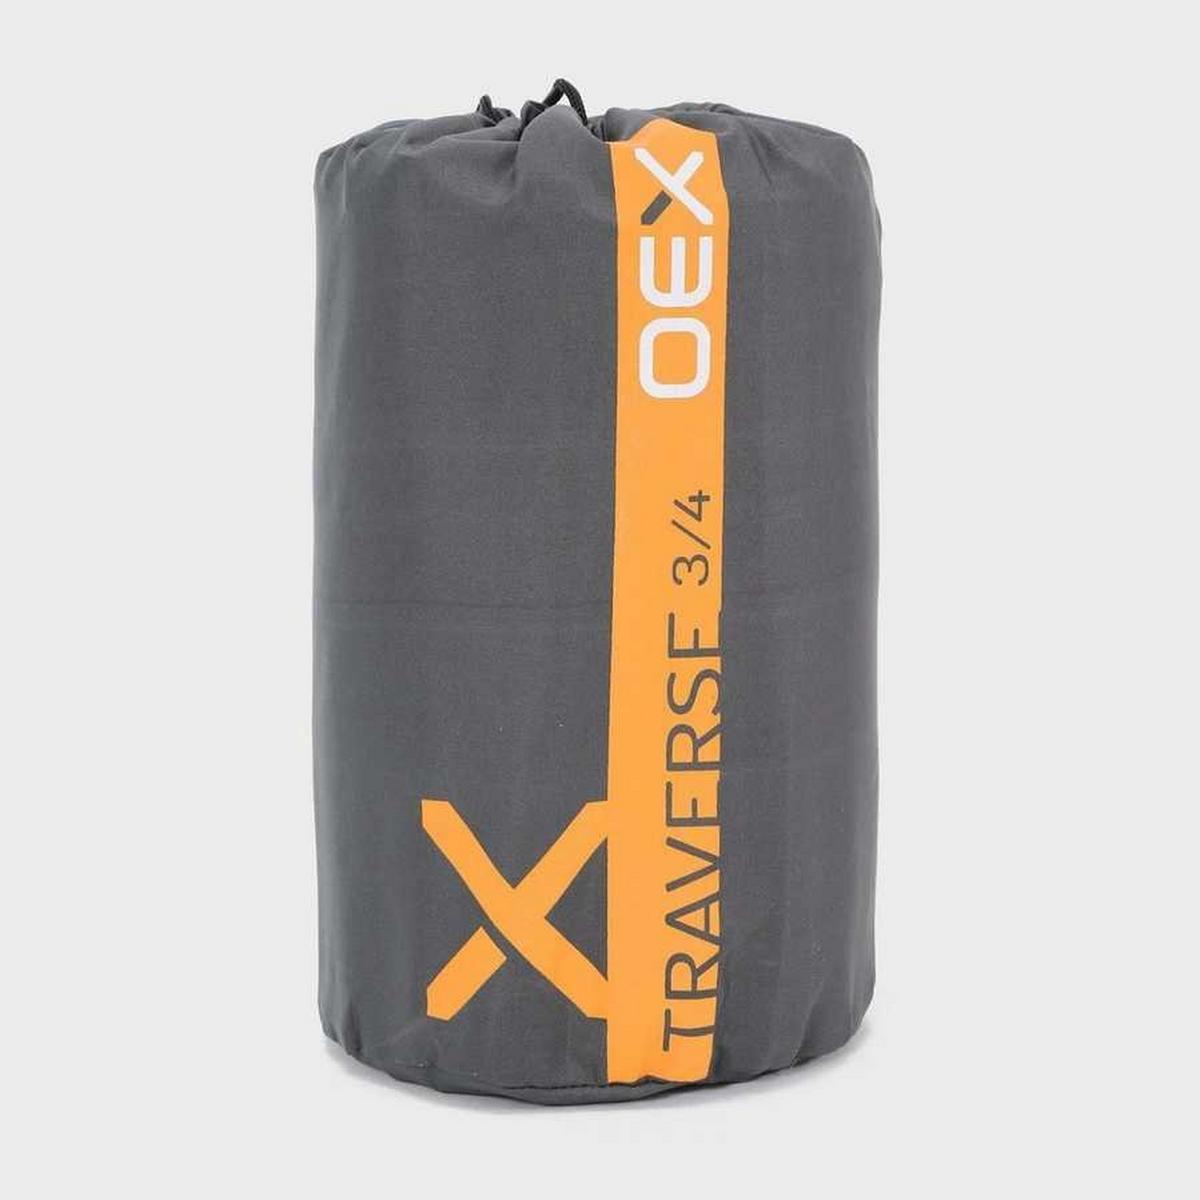 Oex Traverse 3/4 Self-Inflating Mat - Grey